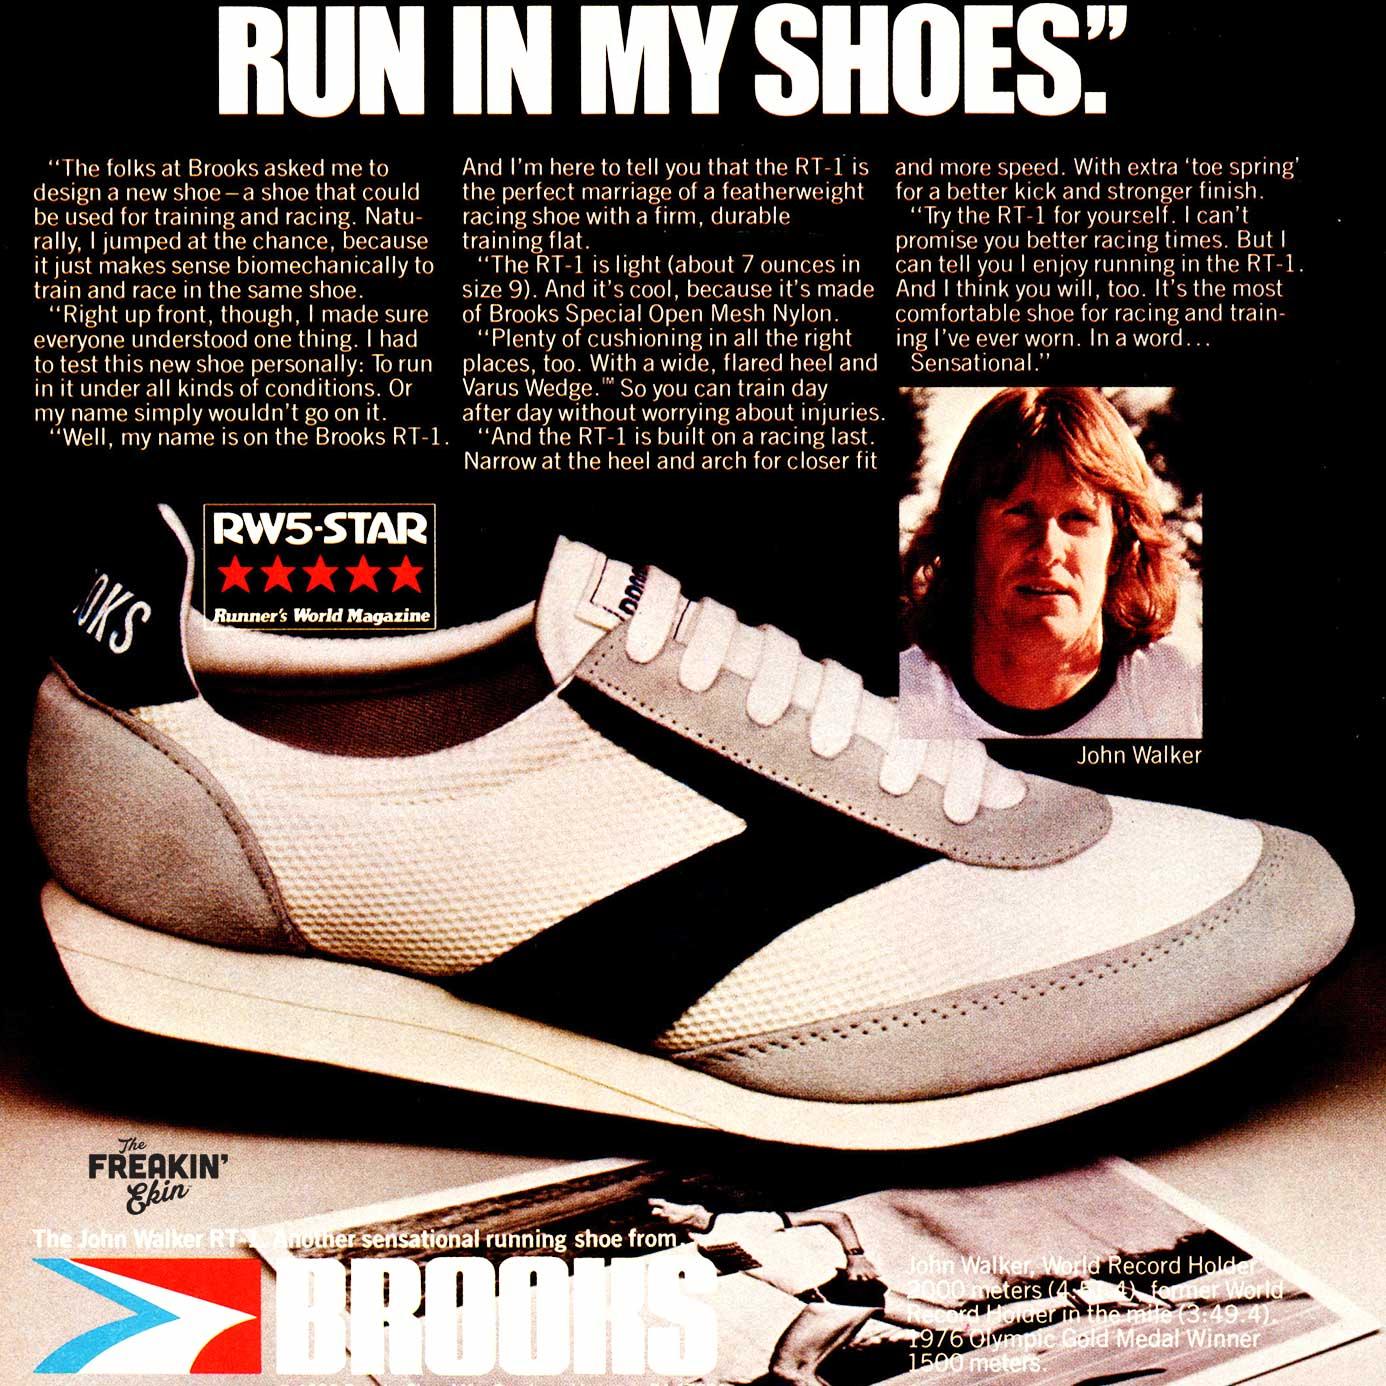 vintage sneaker ad featuring John Walker